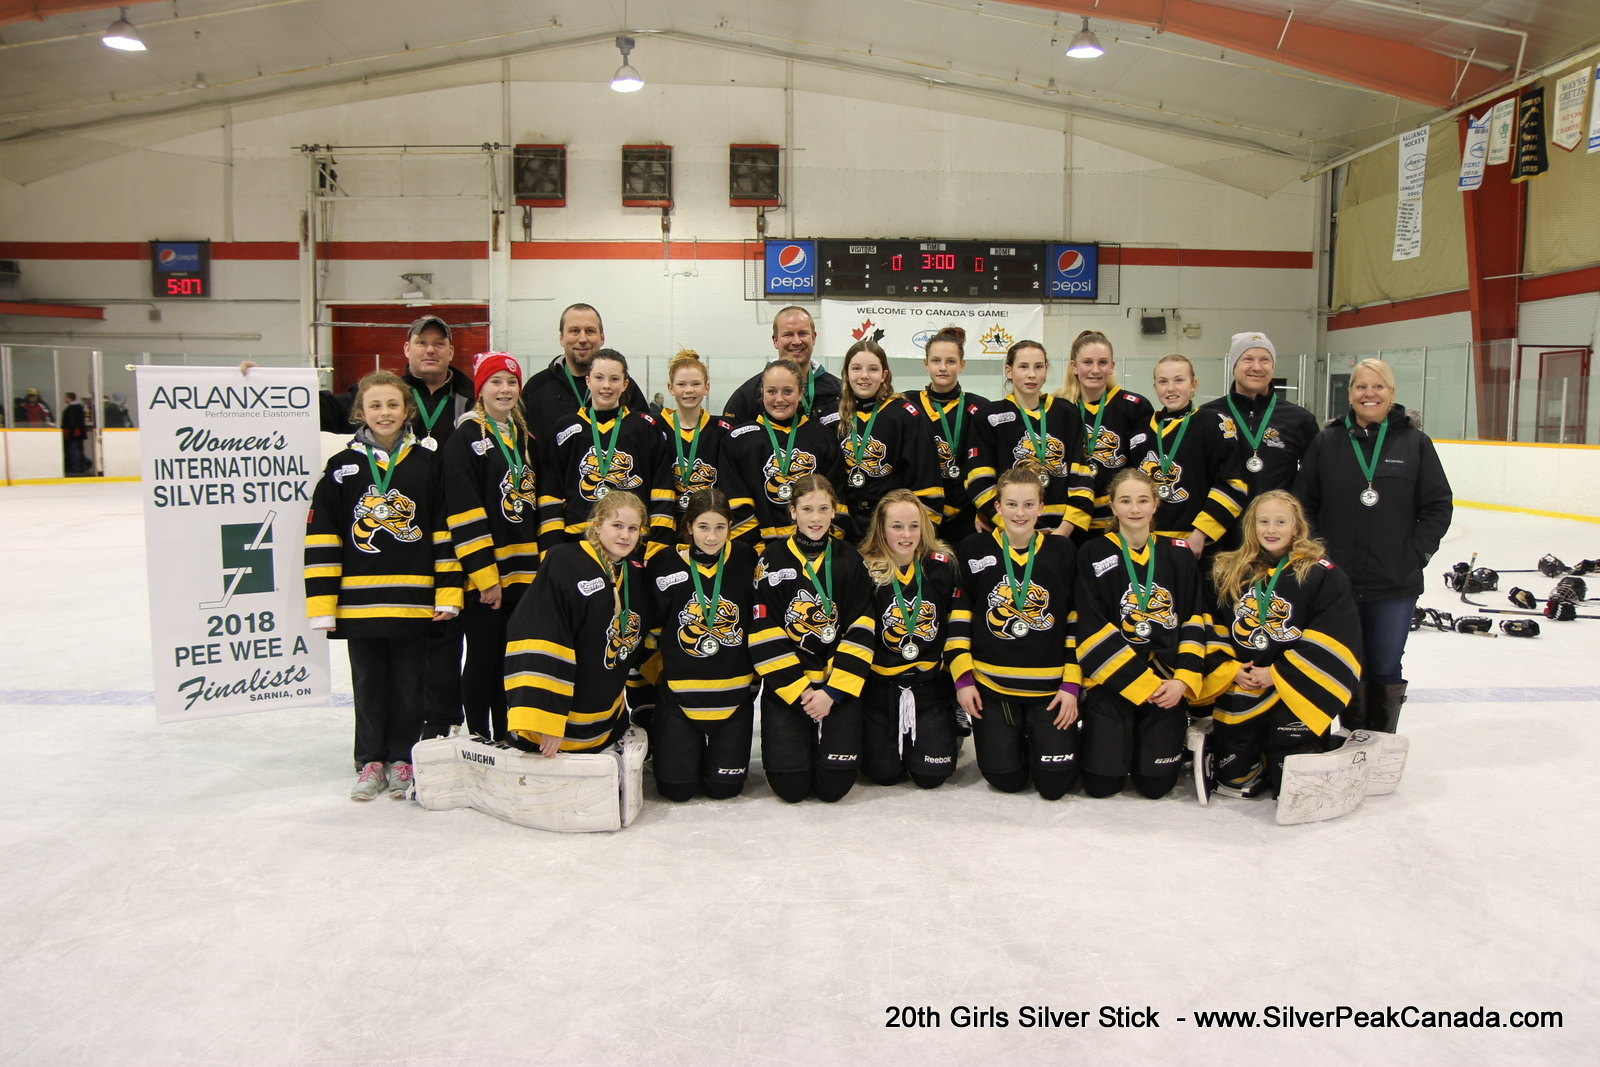 silverpeak studios canada girls silverstick sarnia ontario 2018 (23)